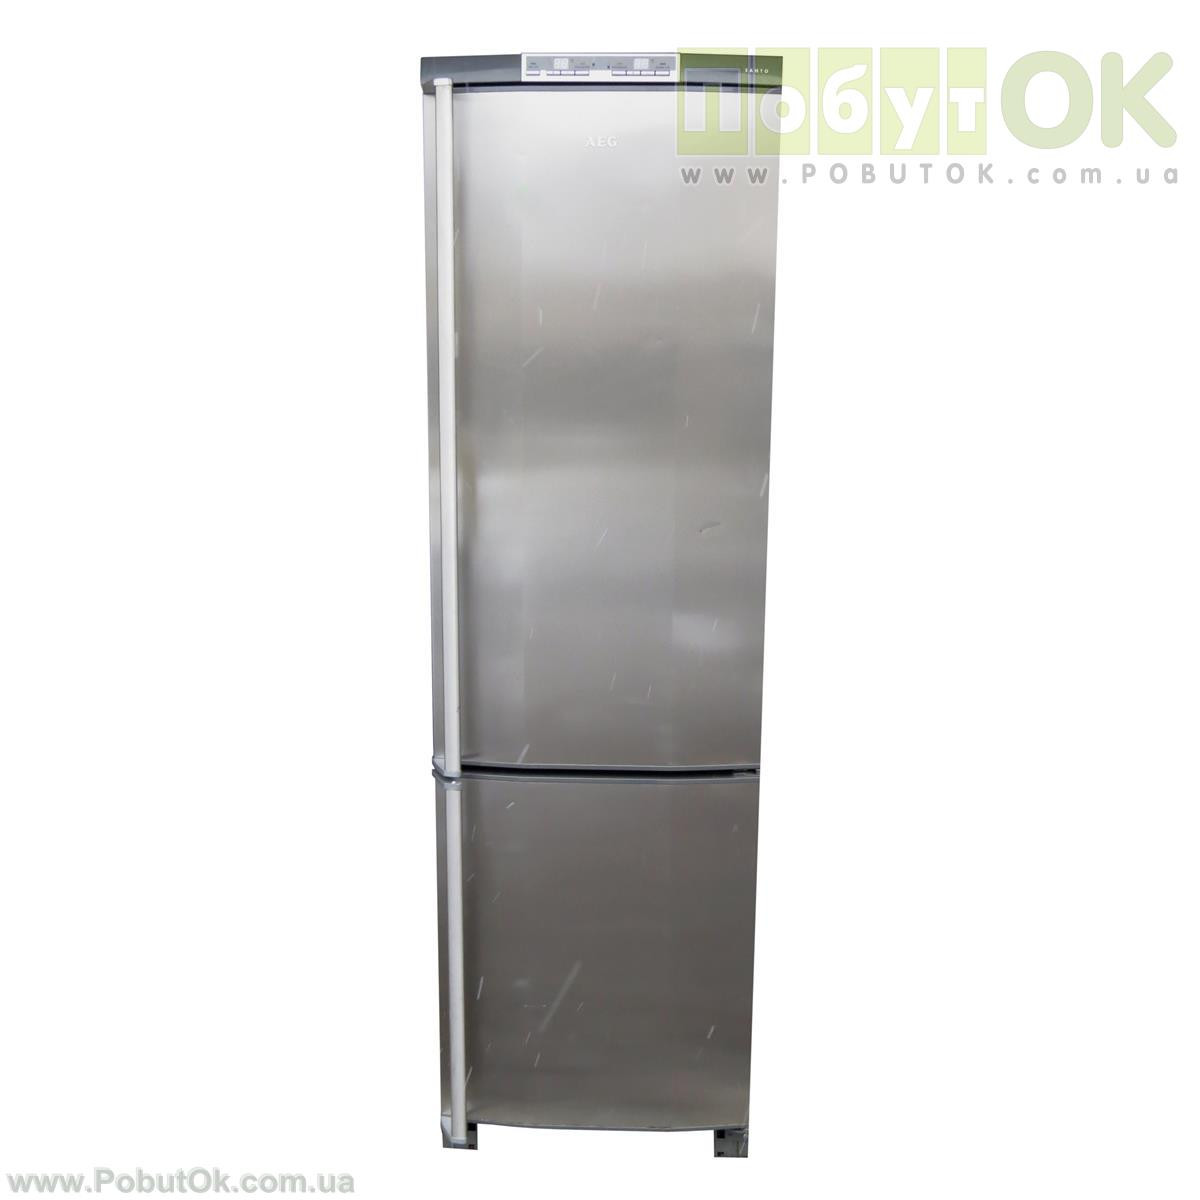 Холодильник AEG 70408-KG (Код:0752) Состояние: Б/У